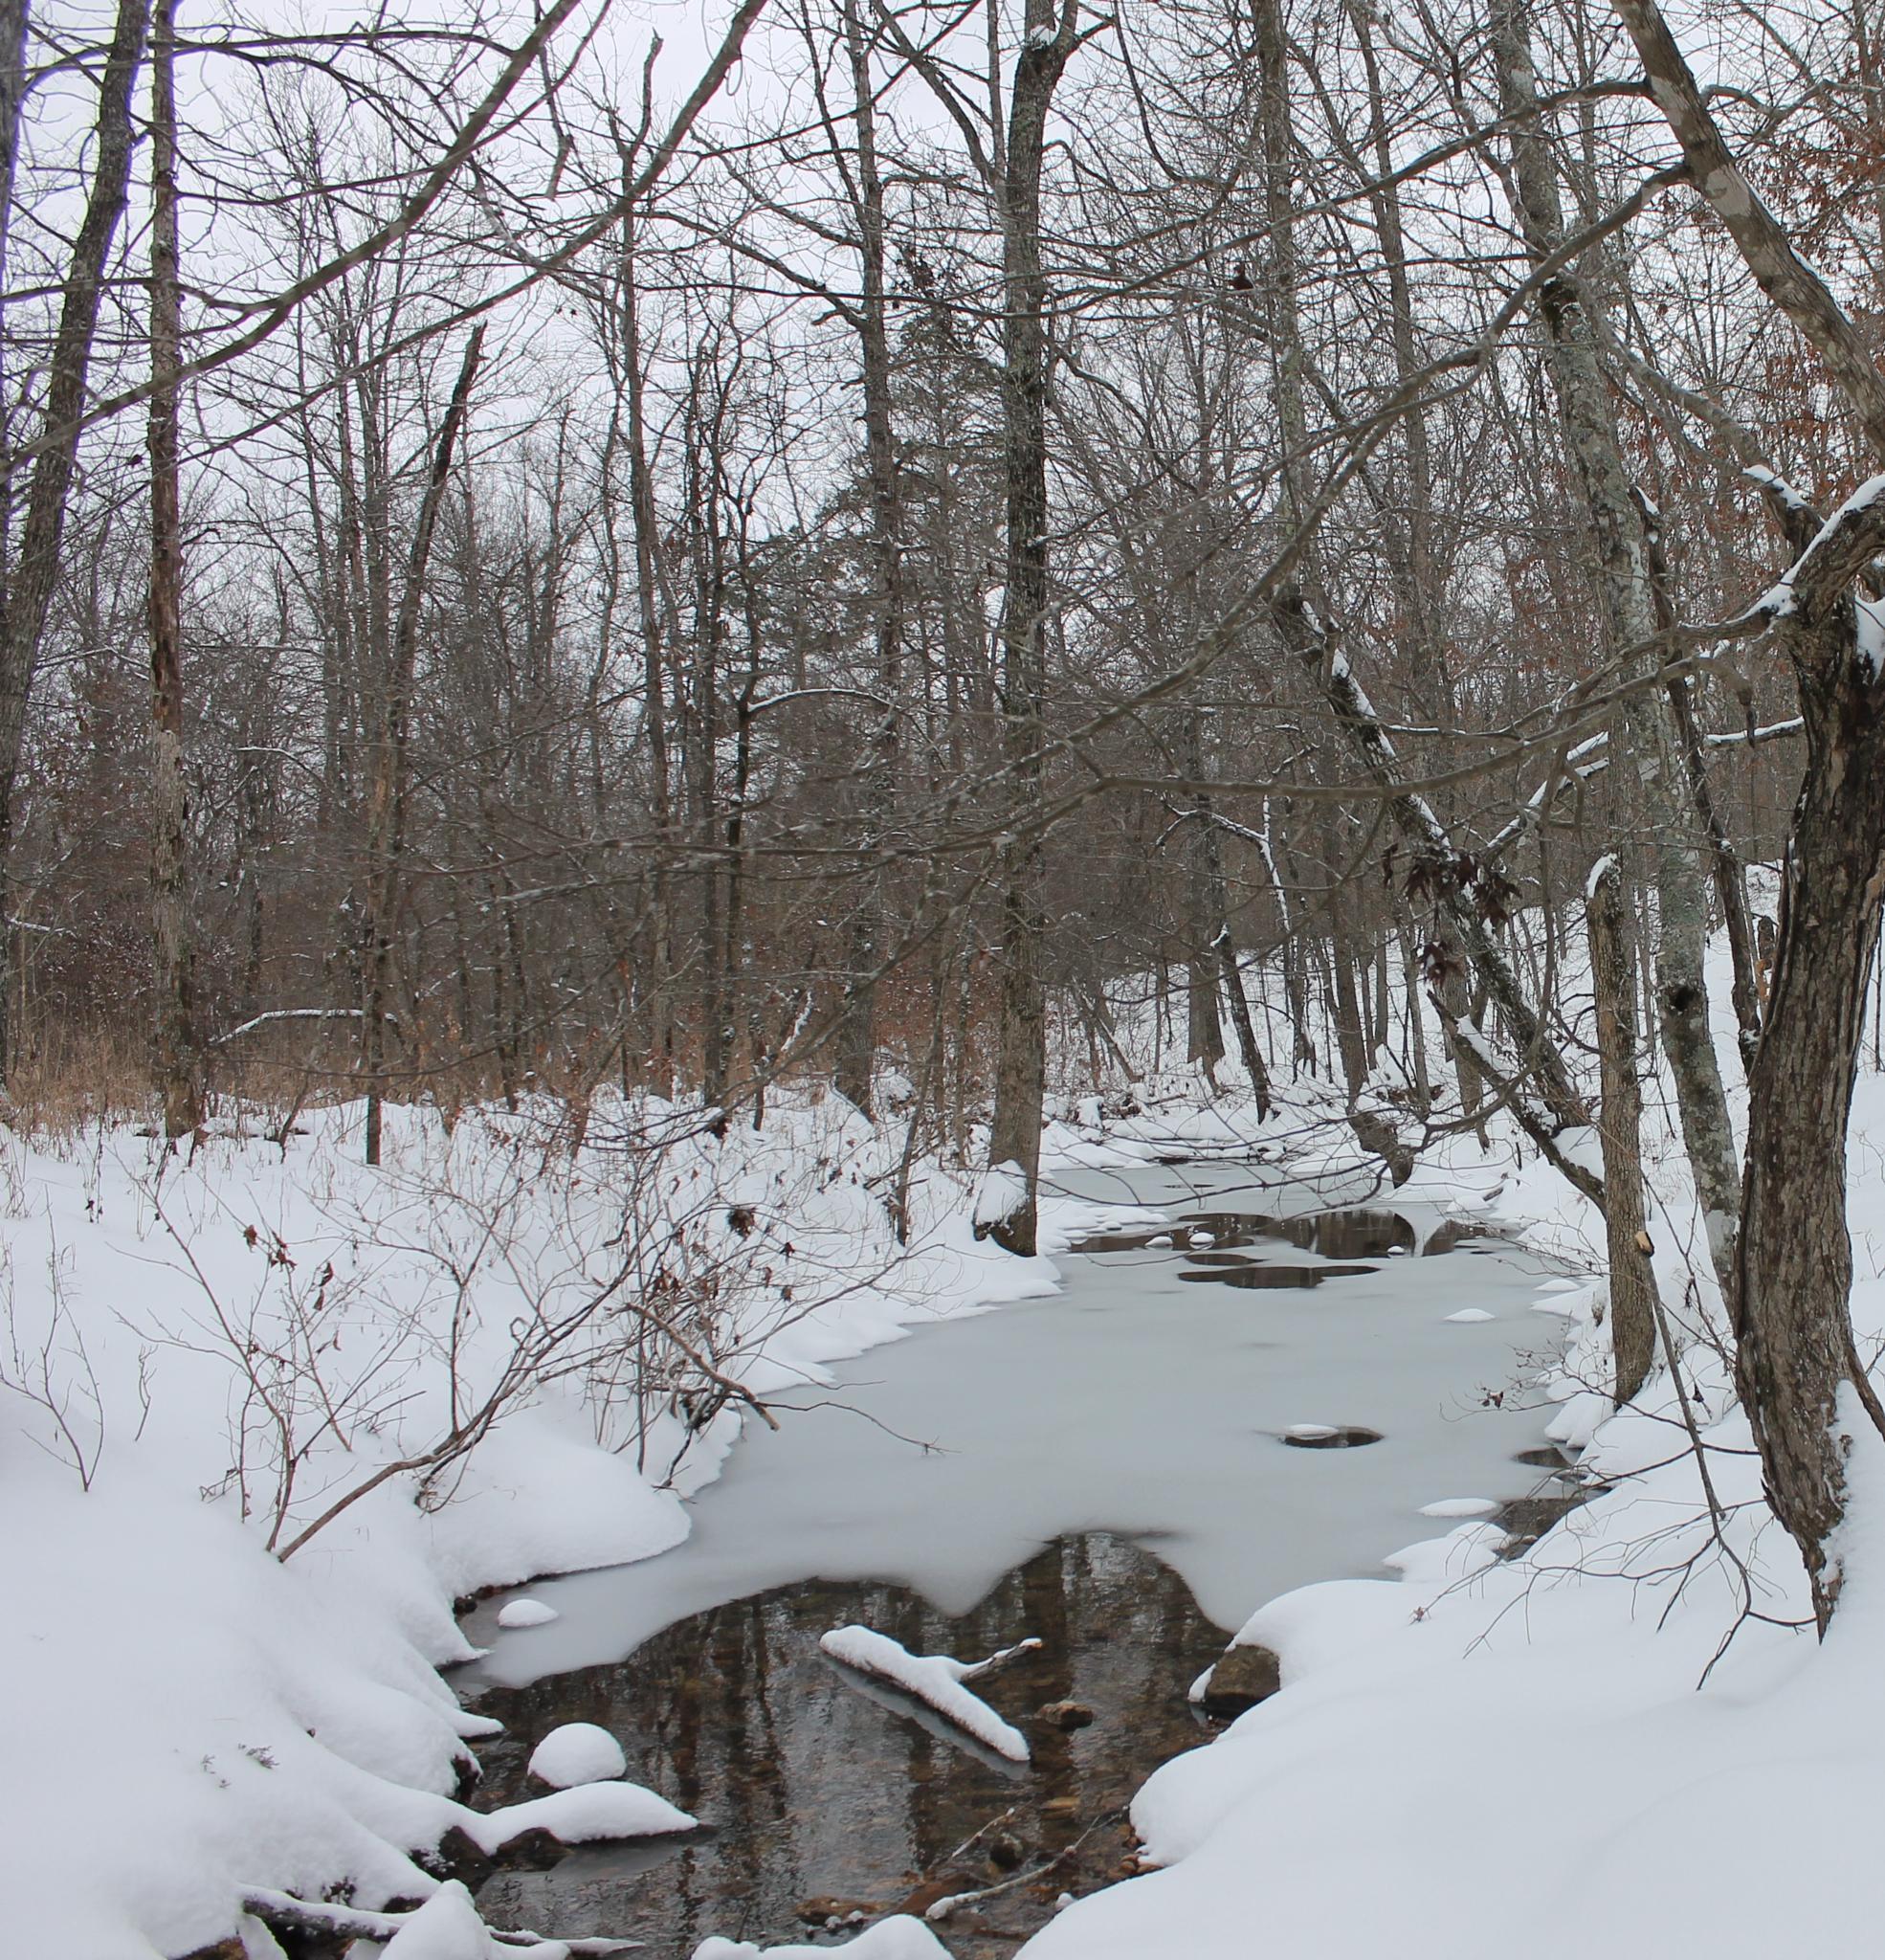 March snow by kristal.dewitt1